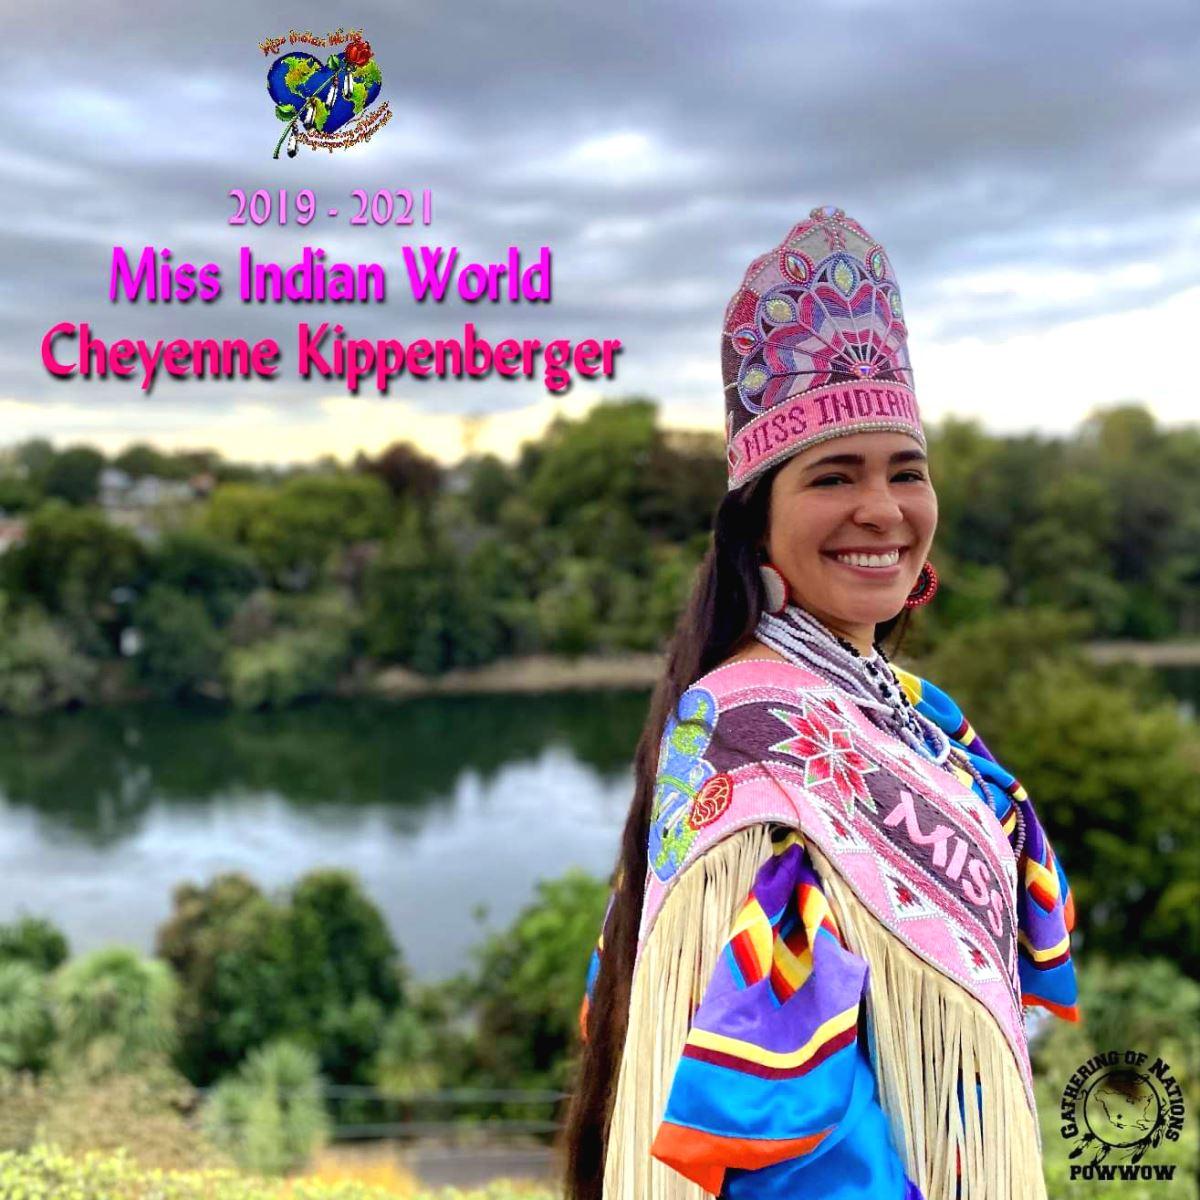 Miss Indian World Cheyenne Kippenberger